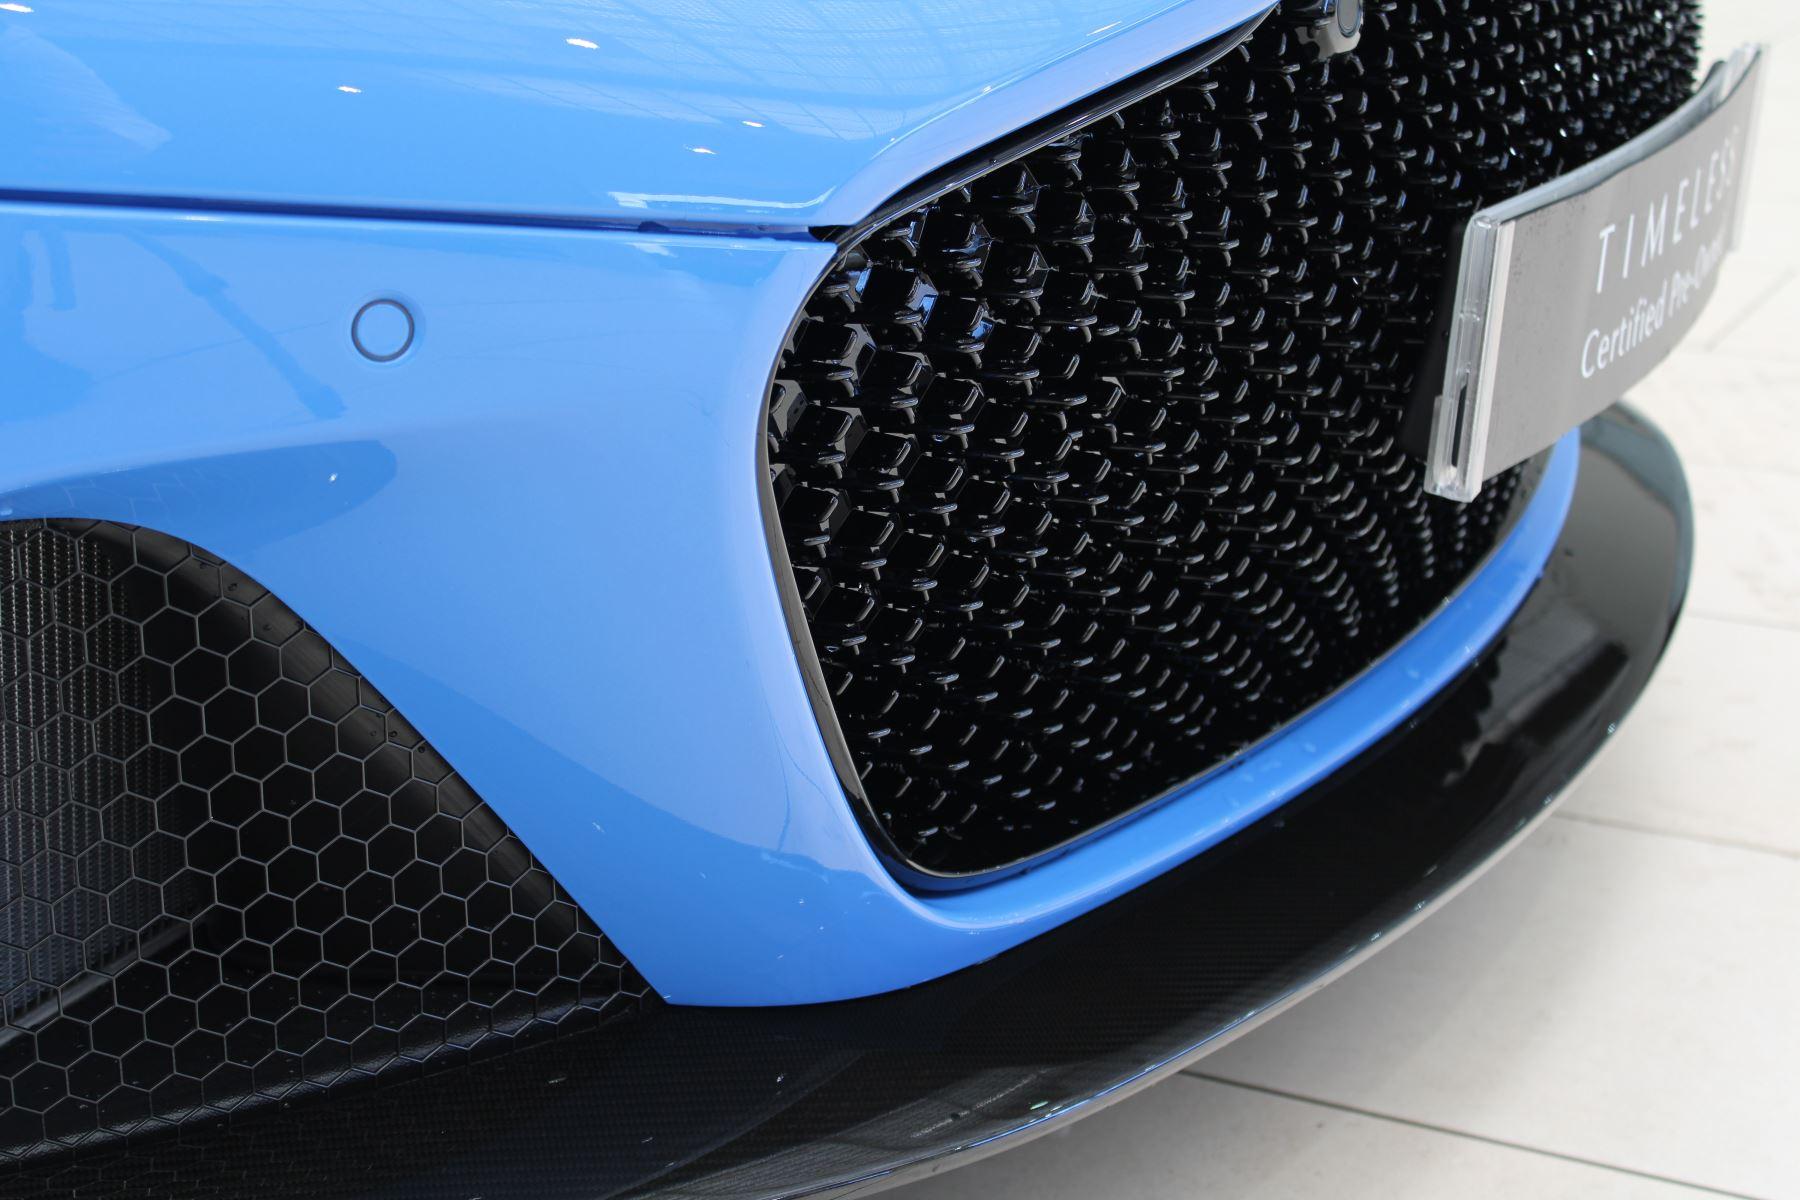 Aston Martin DBS V12 Superleggera Touchtronic Special Ceramic Blue - B&O image 14